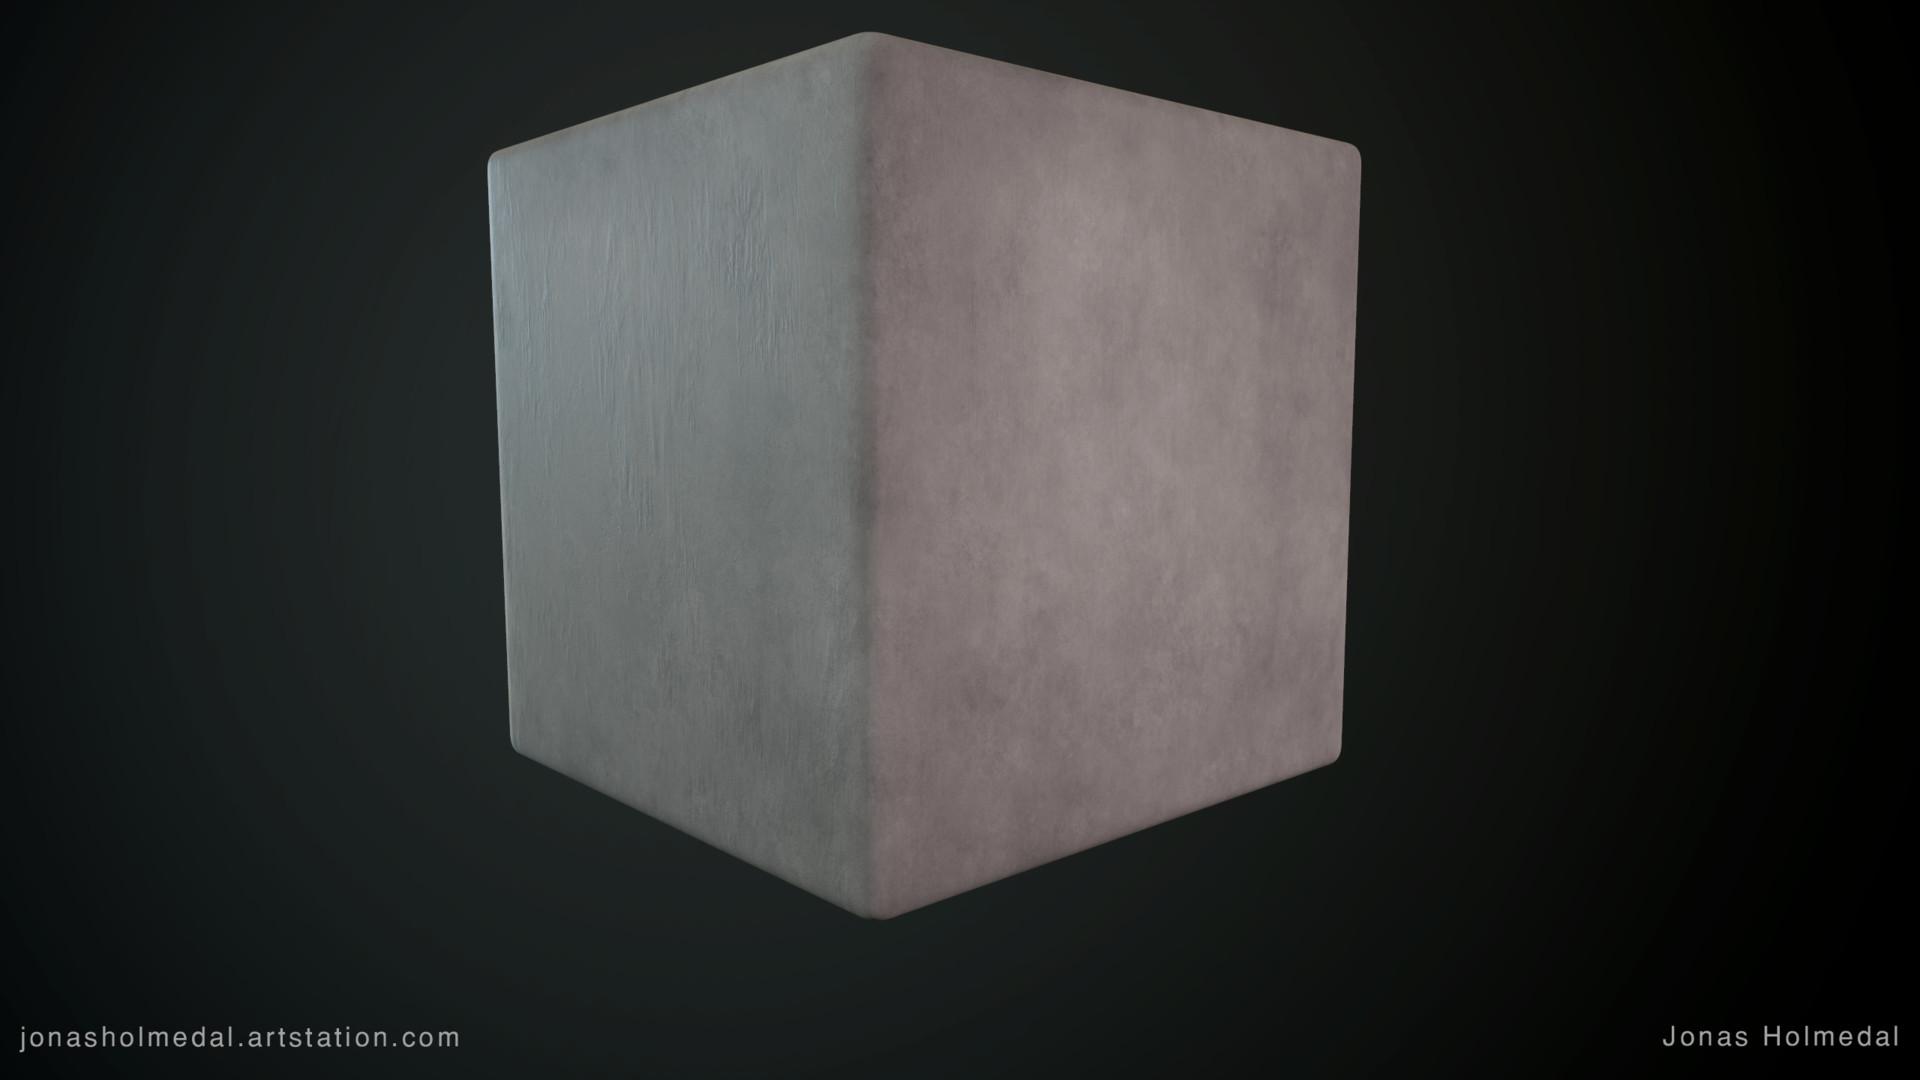 Jonas holmedal concrete bunker